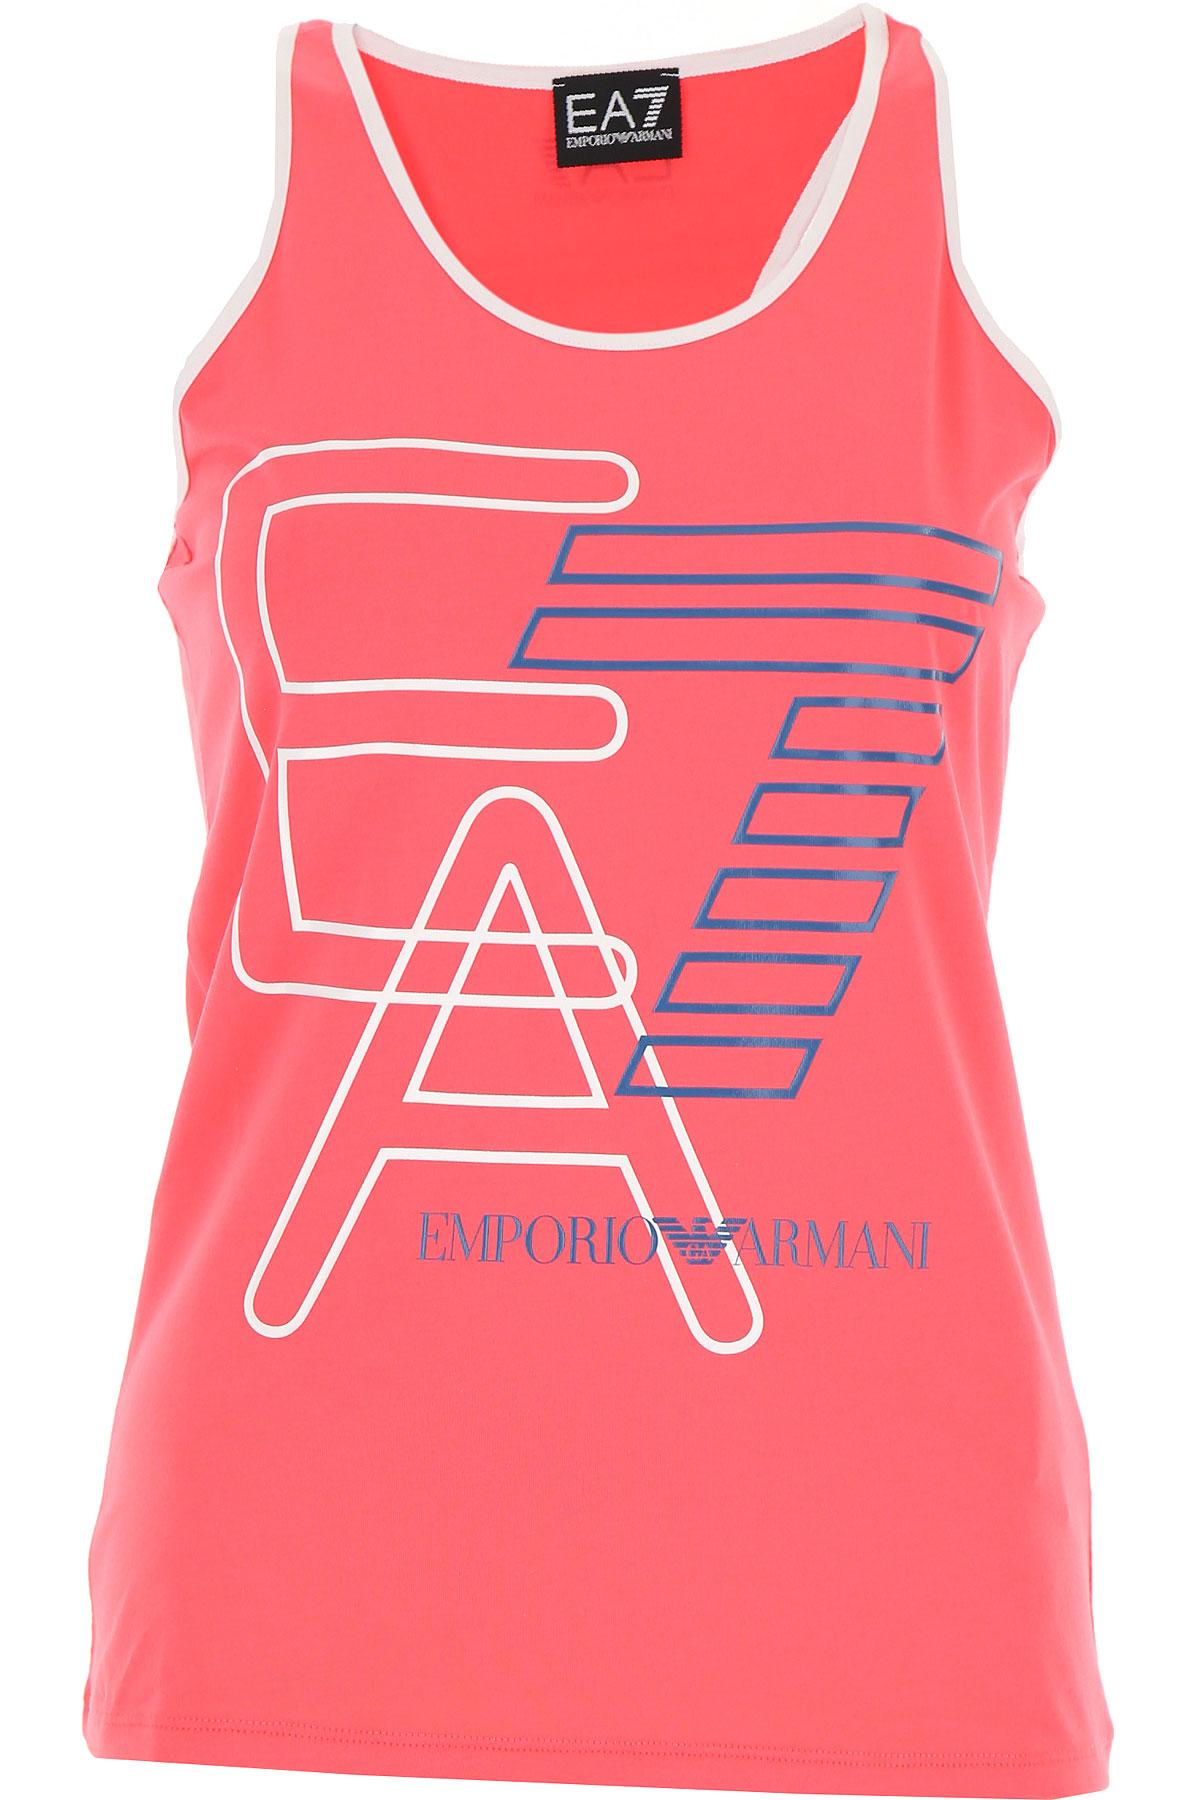 emporio armani sportbekleidung sport kleidung, sport mode